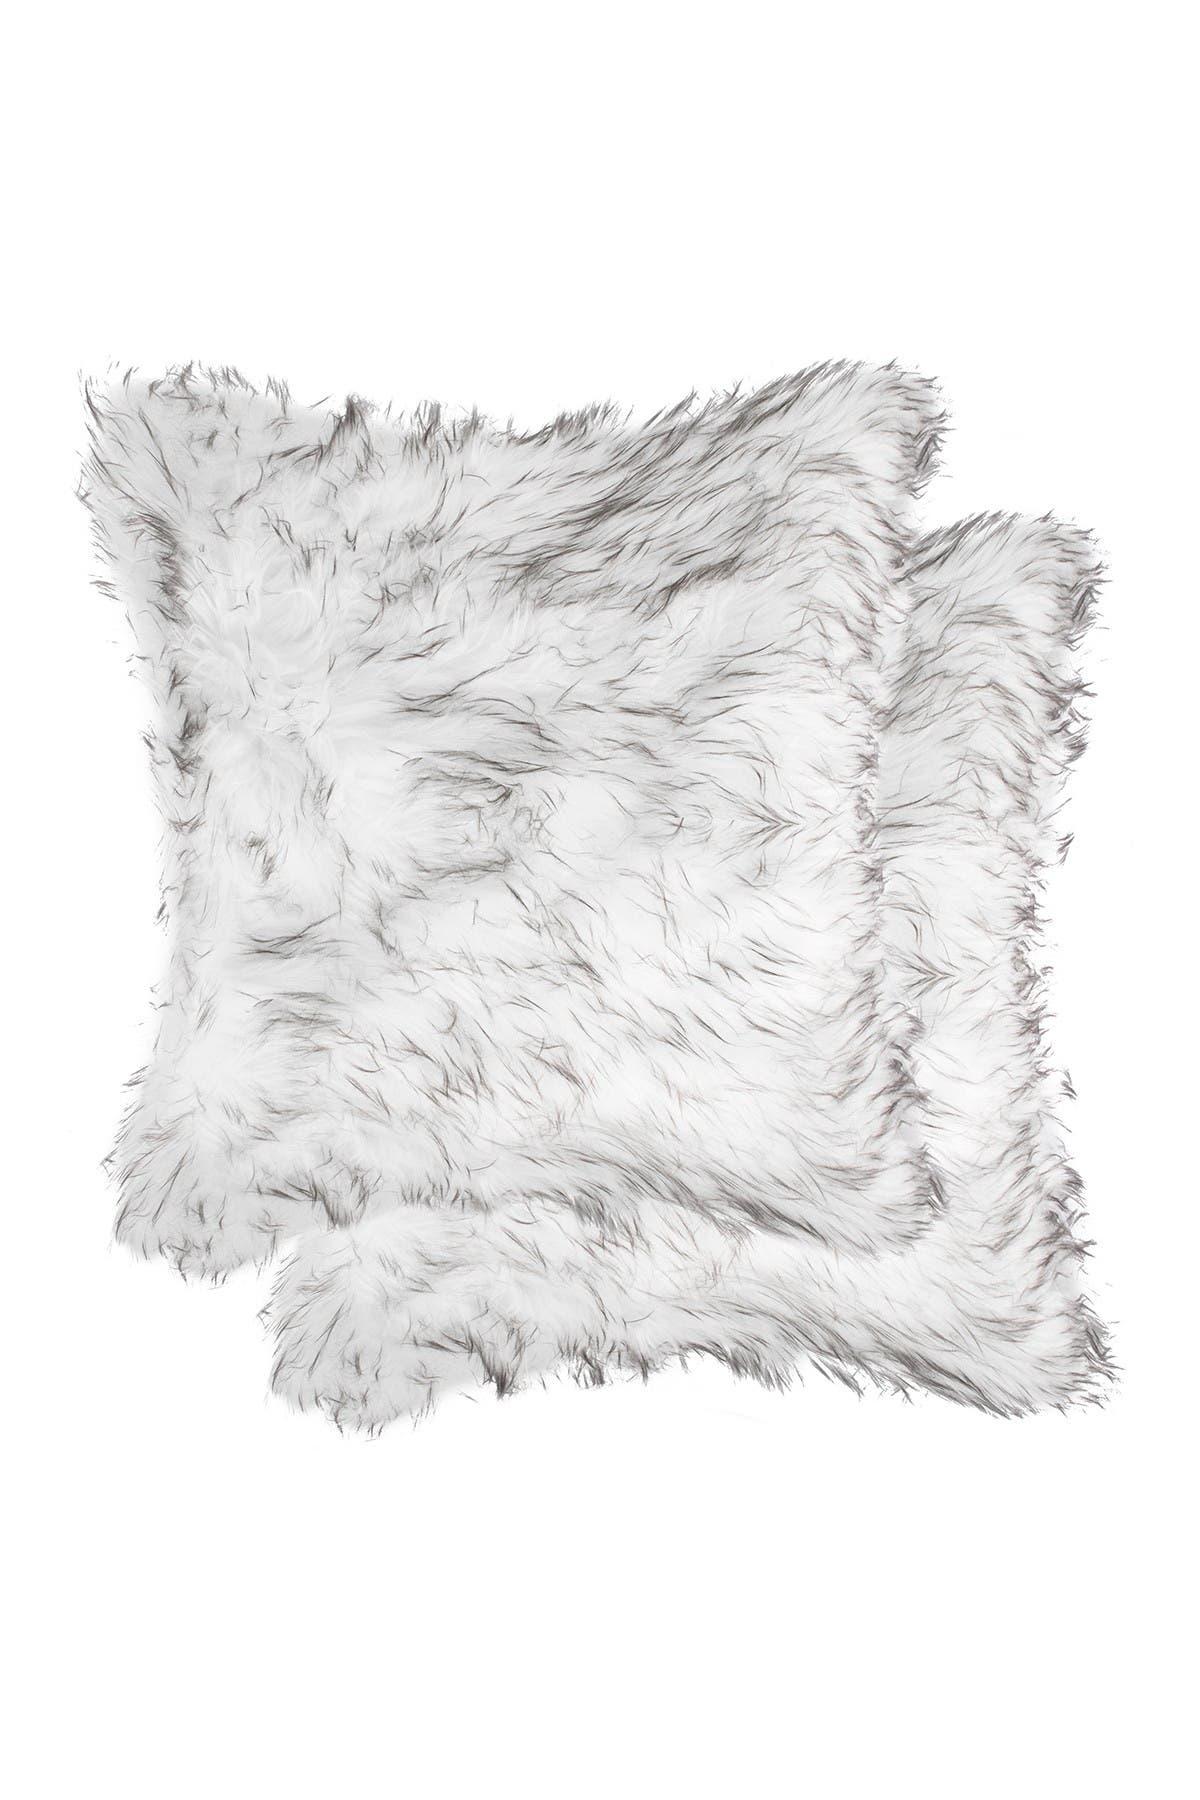 "Image of LUXE Belton Faux Fur Pillow - Set of 2 - 18"" x 18"" - Gradient Grey"